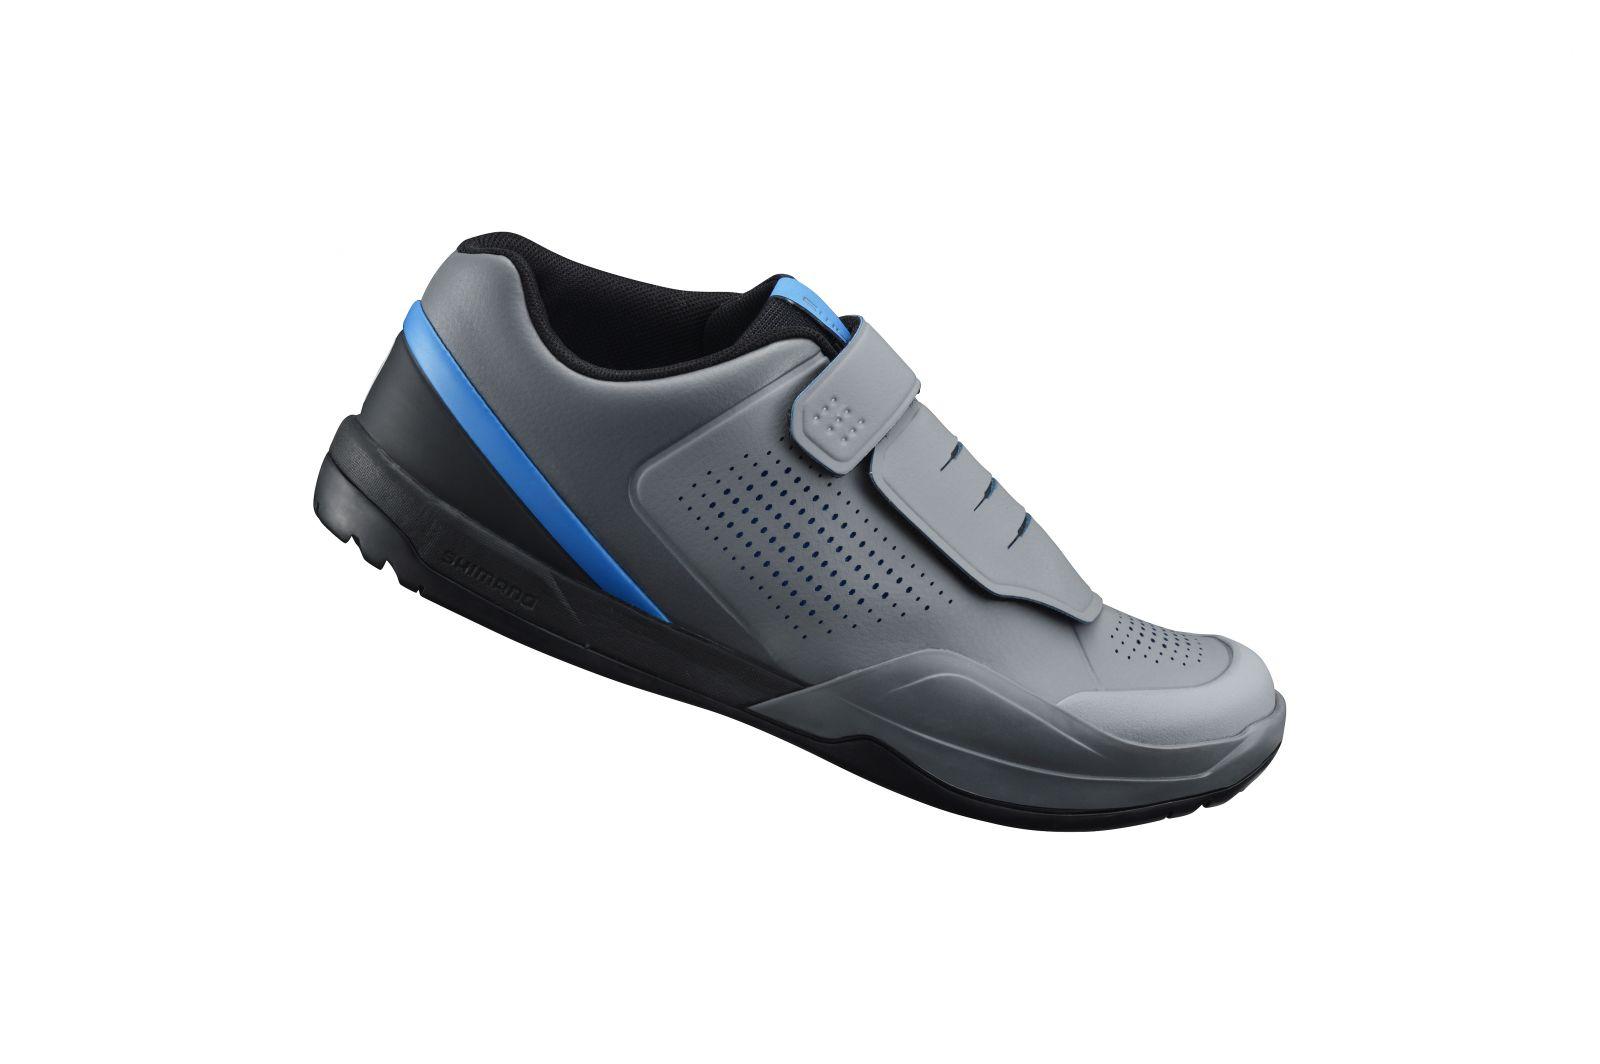 SHIMANO MTB obuv SH-AM901MG, šedá modrá, 42